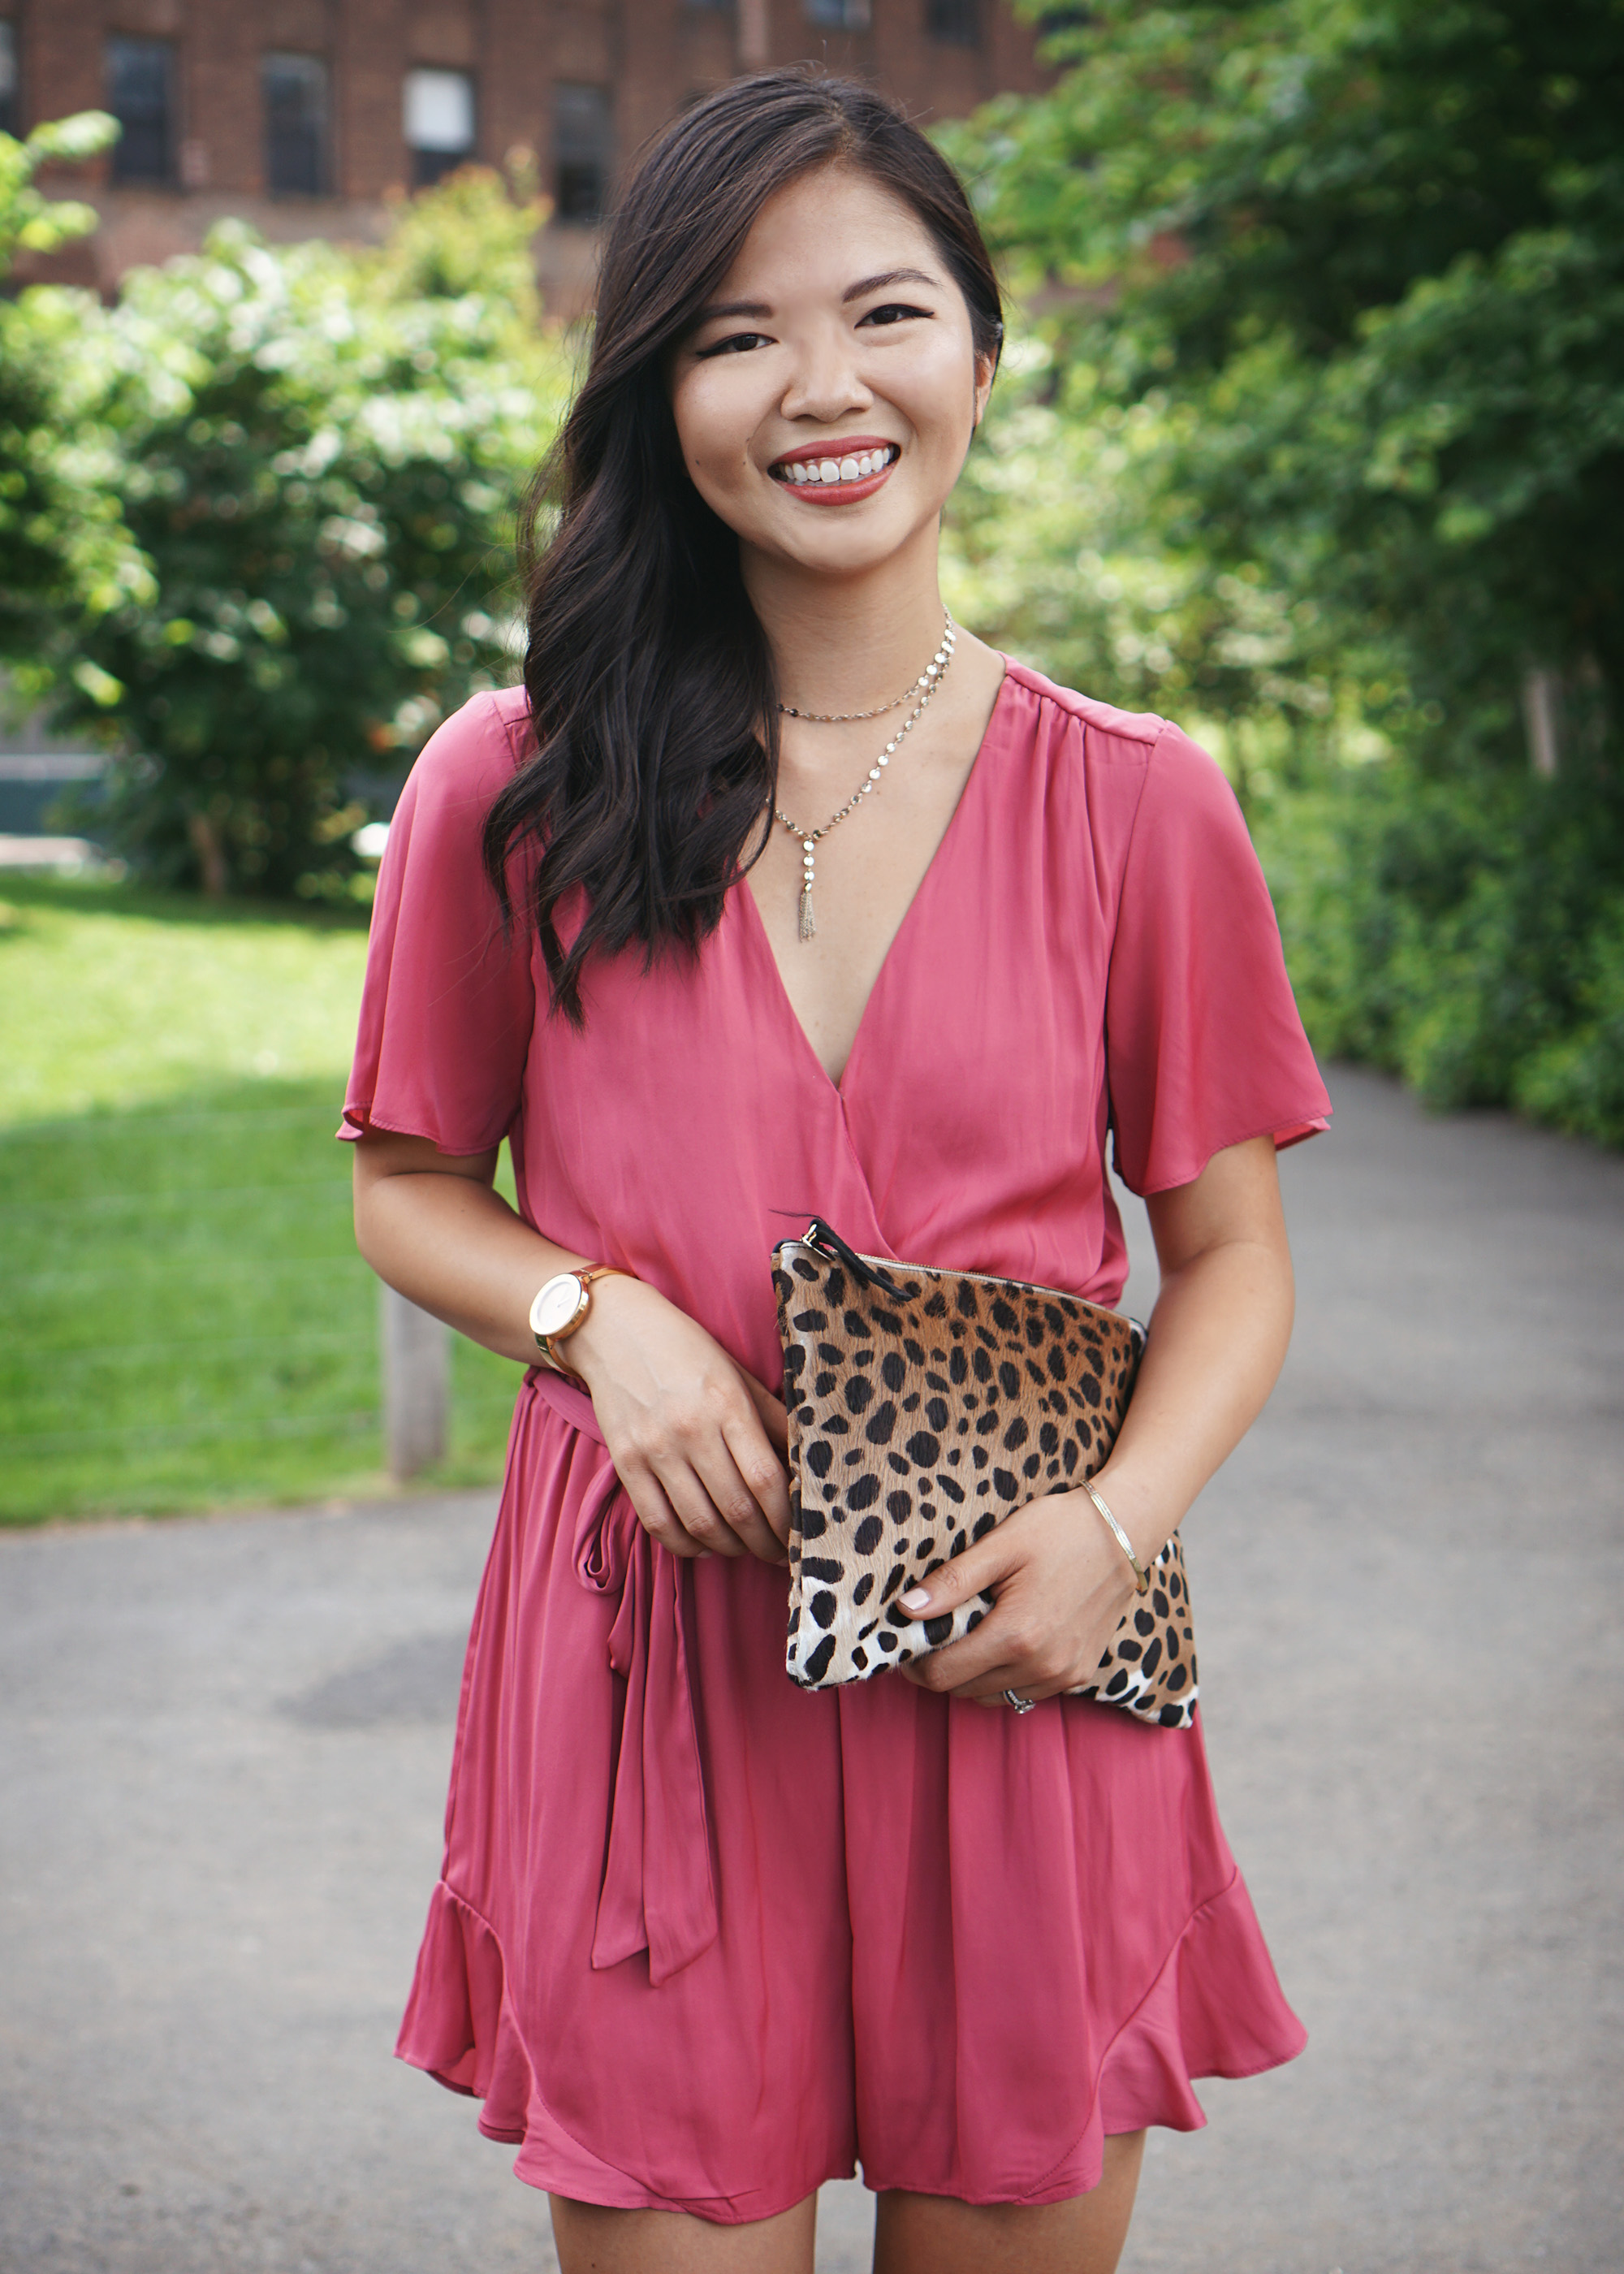 Summer Style / Pink Satin Romper & Leopard Clutch